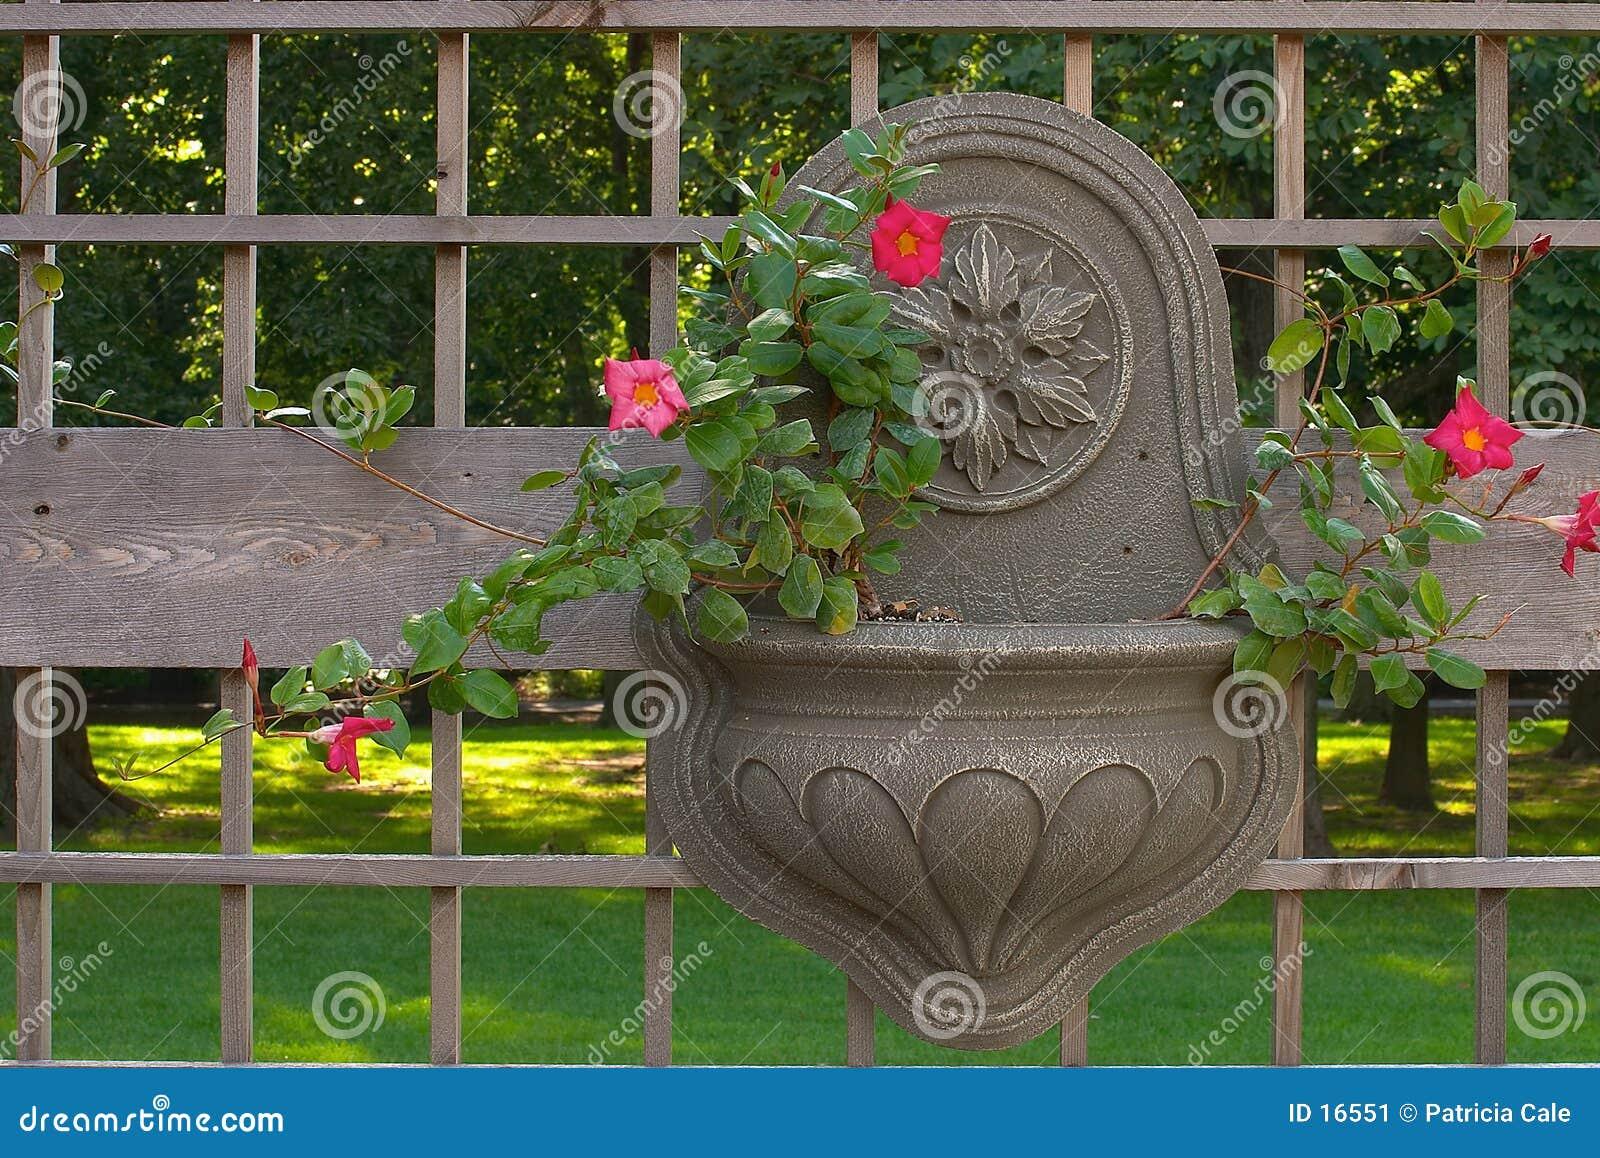 Hanging Garden Container